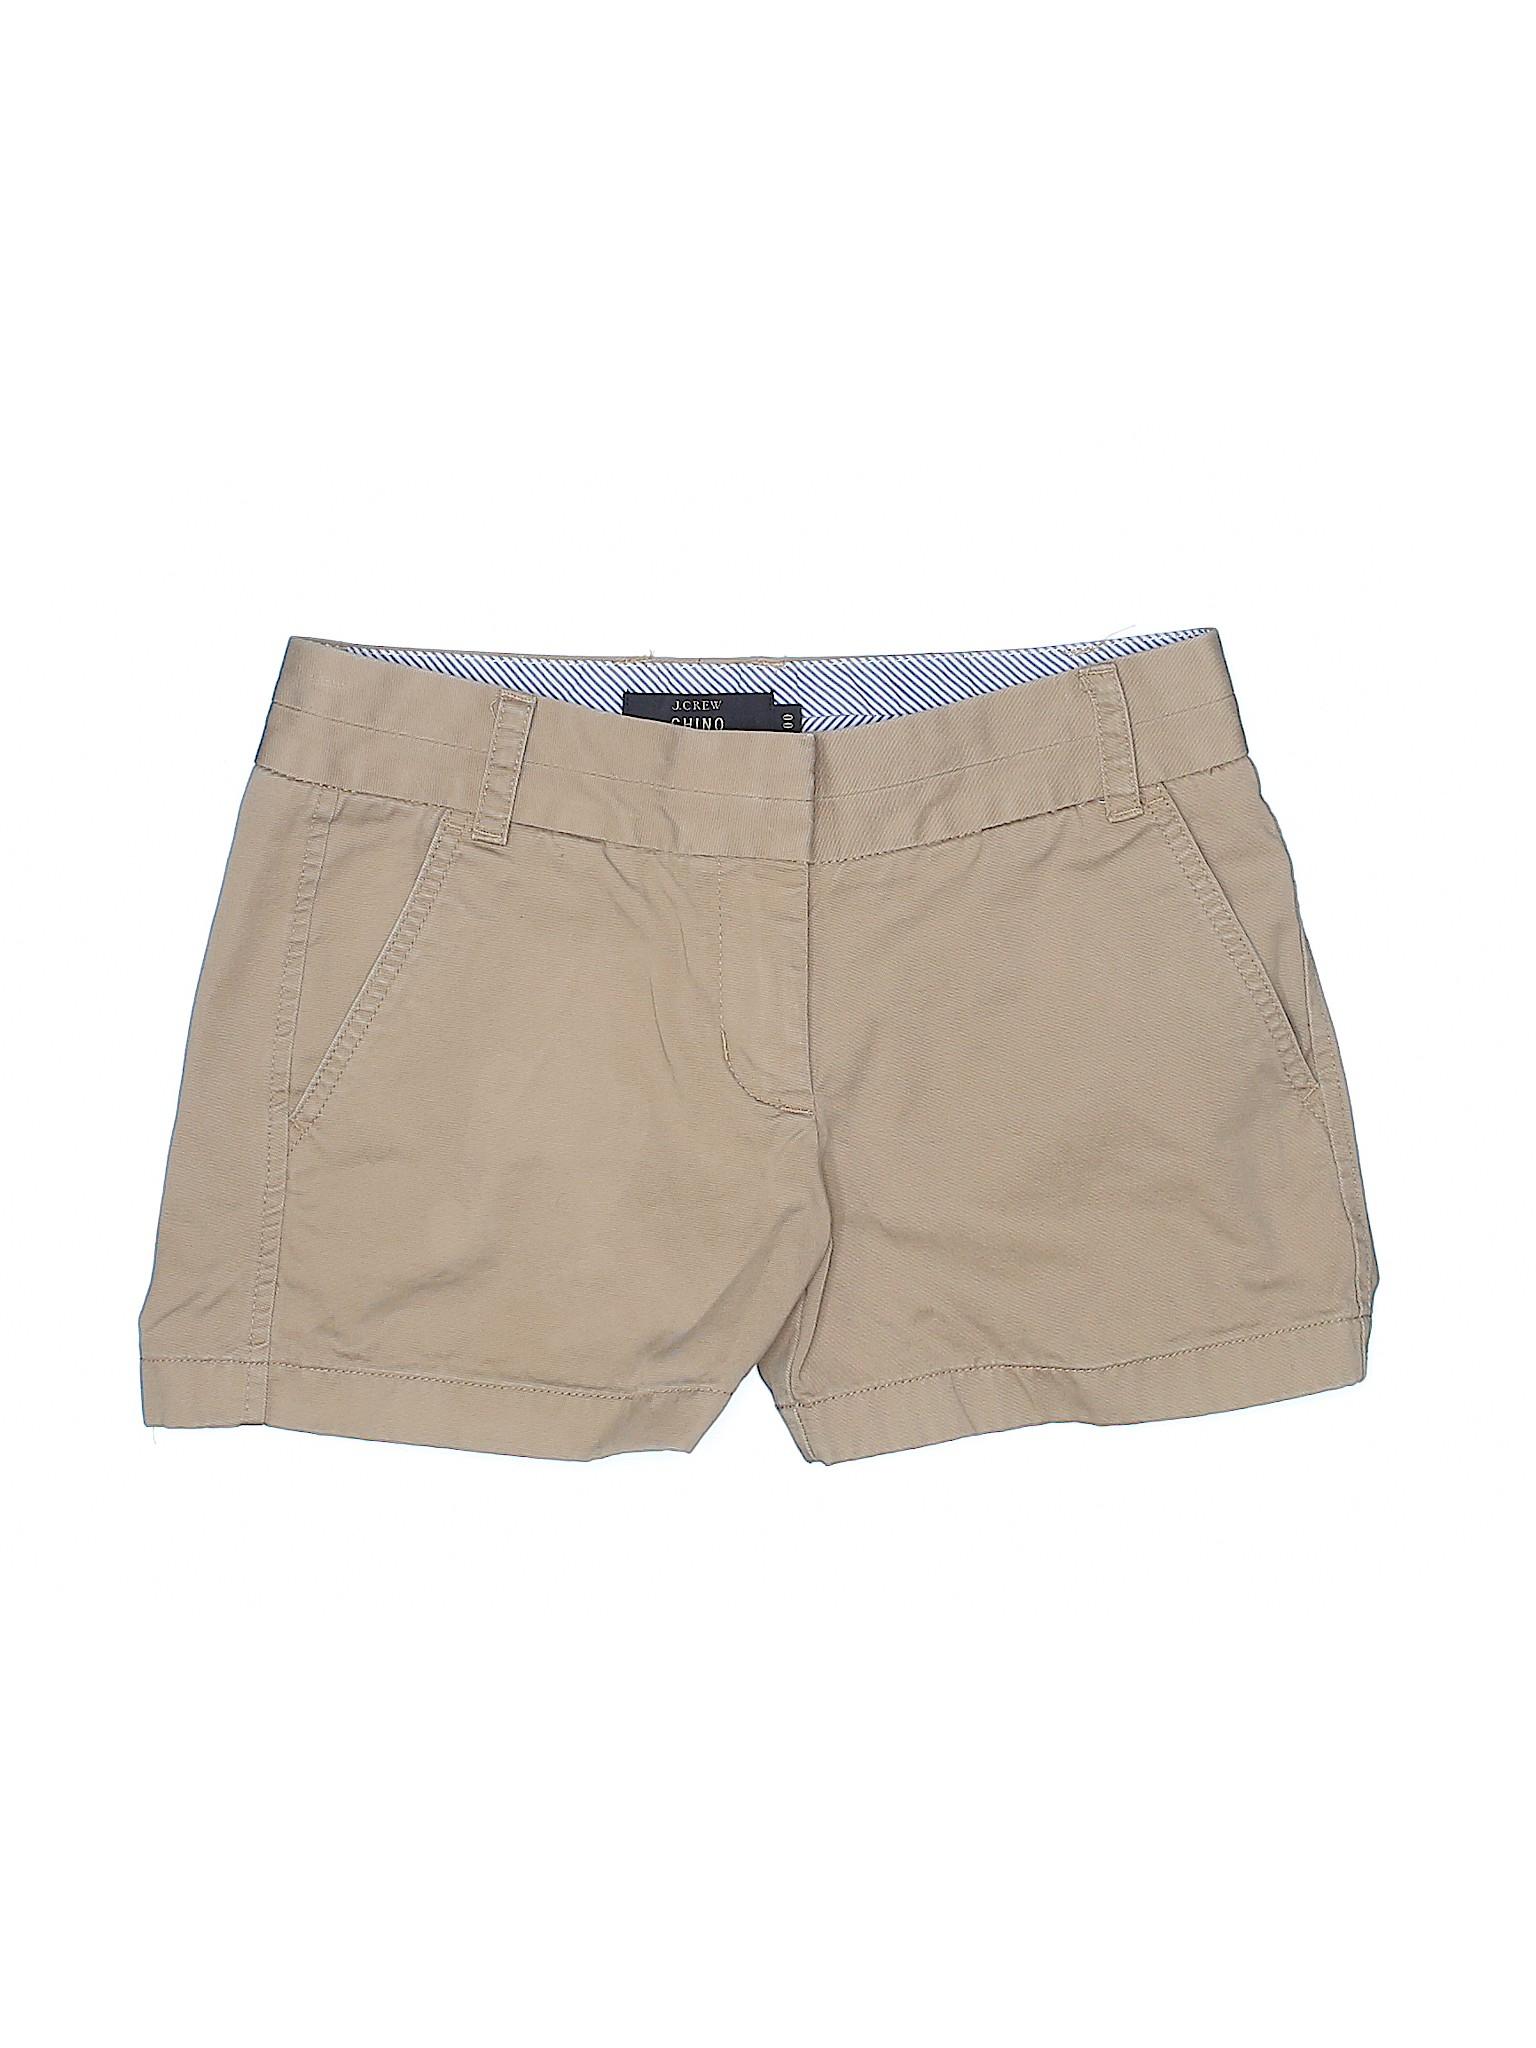 Shorts J Khaki Crew leisure Boutique qI5wFF